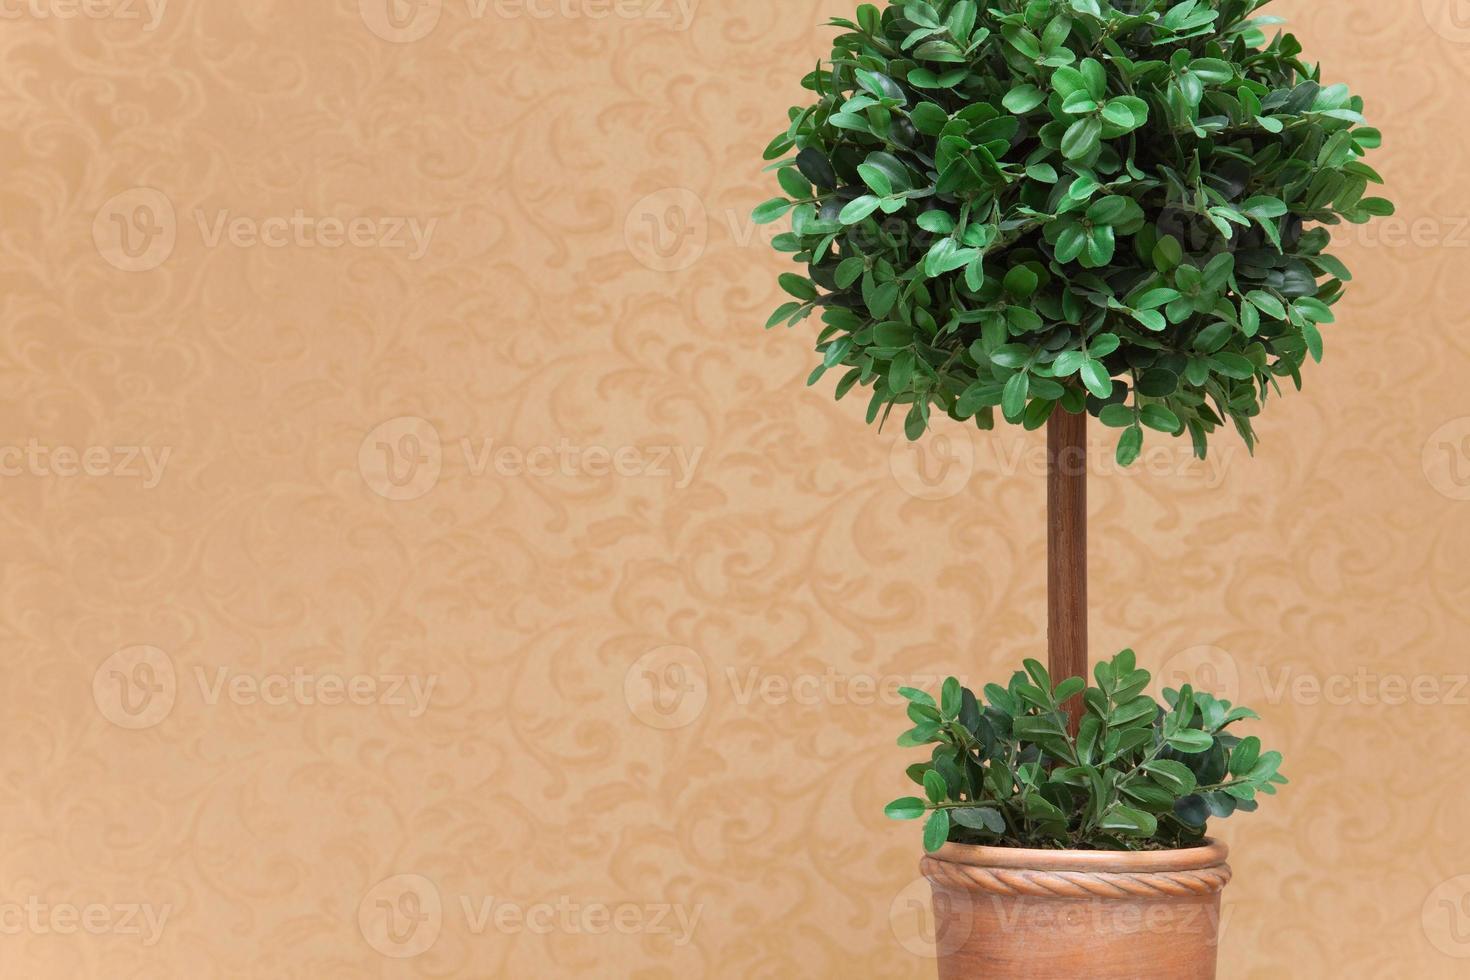 topiaria close-up foto